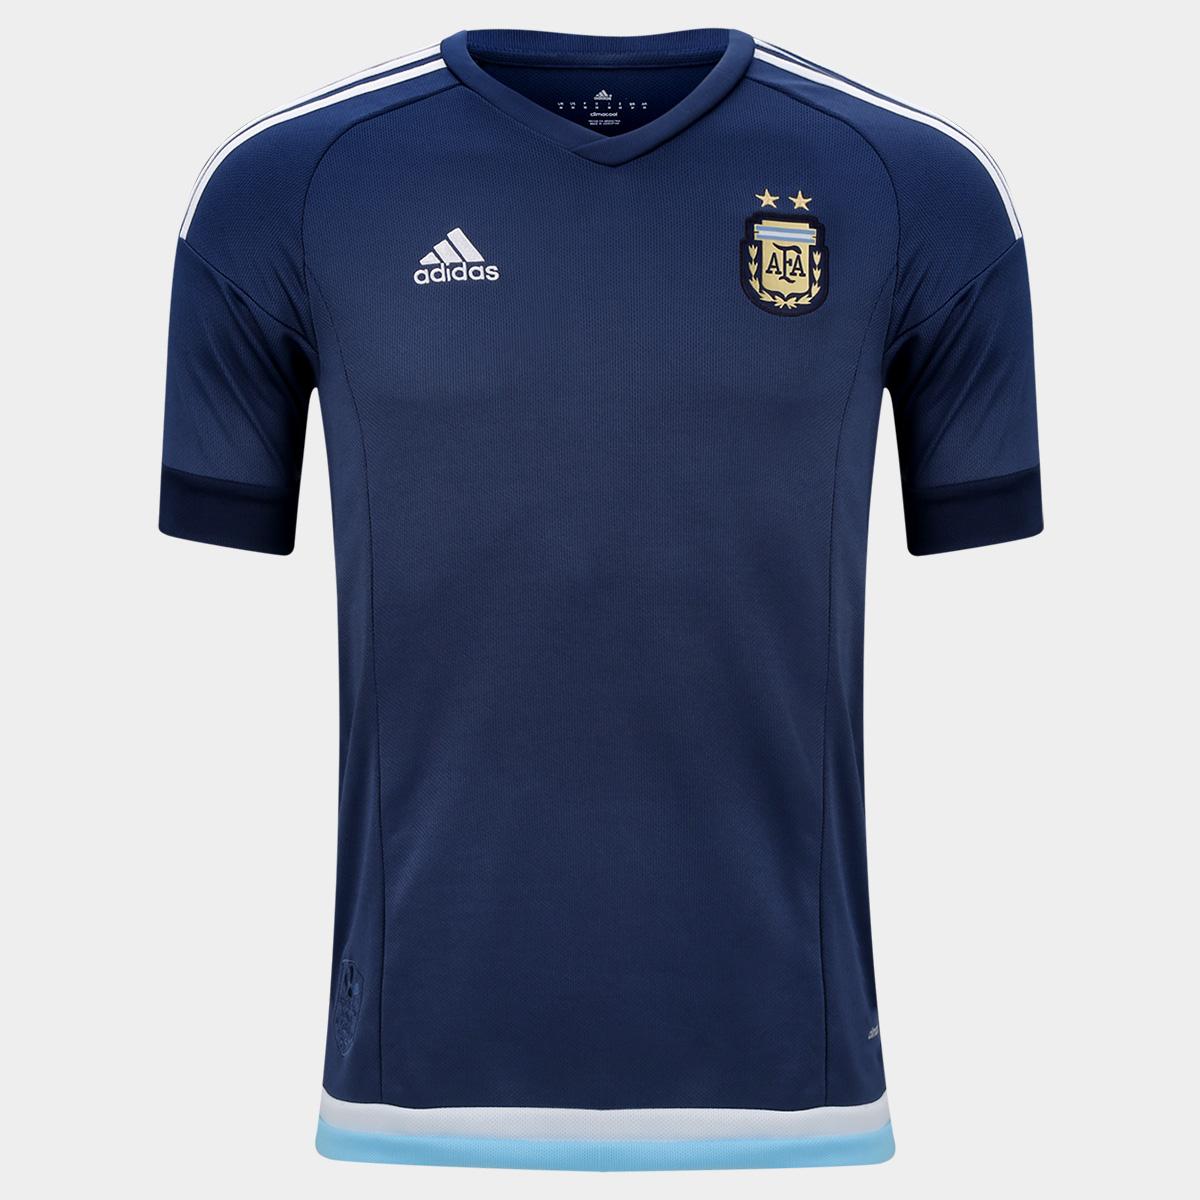 Maillot de Foot adidas AFA Argentine 2016